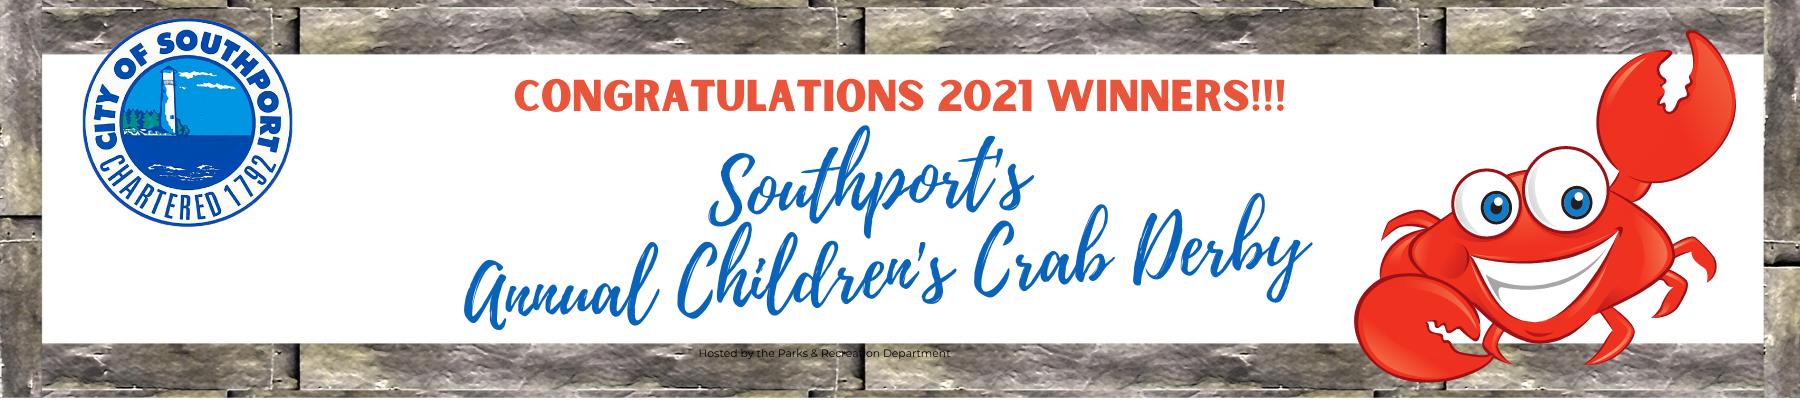 Crab Derby Winners